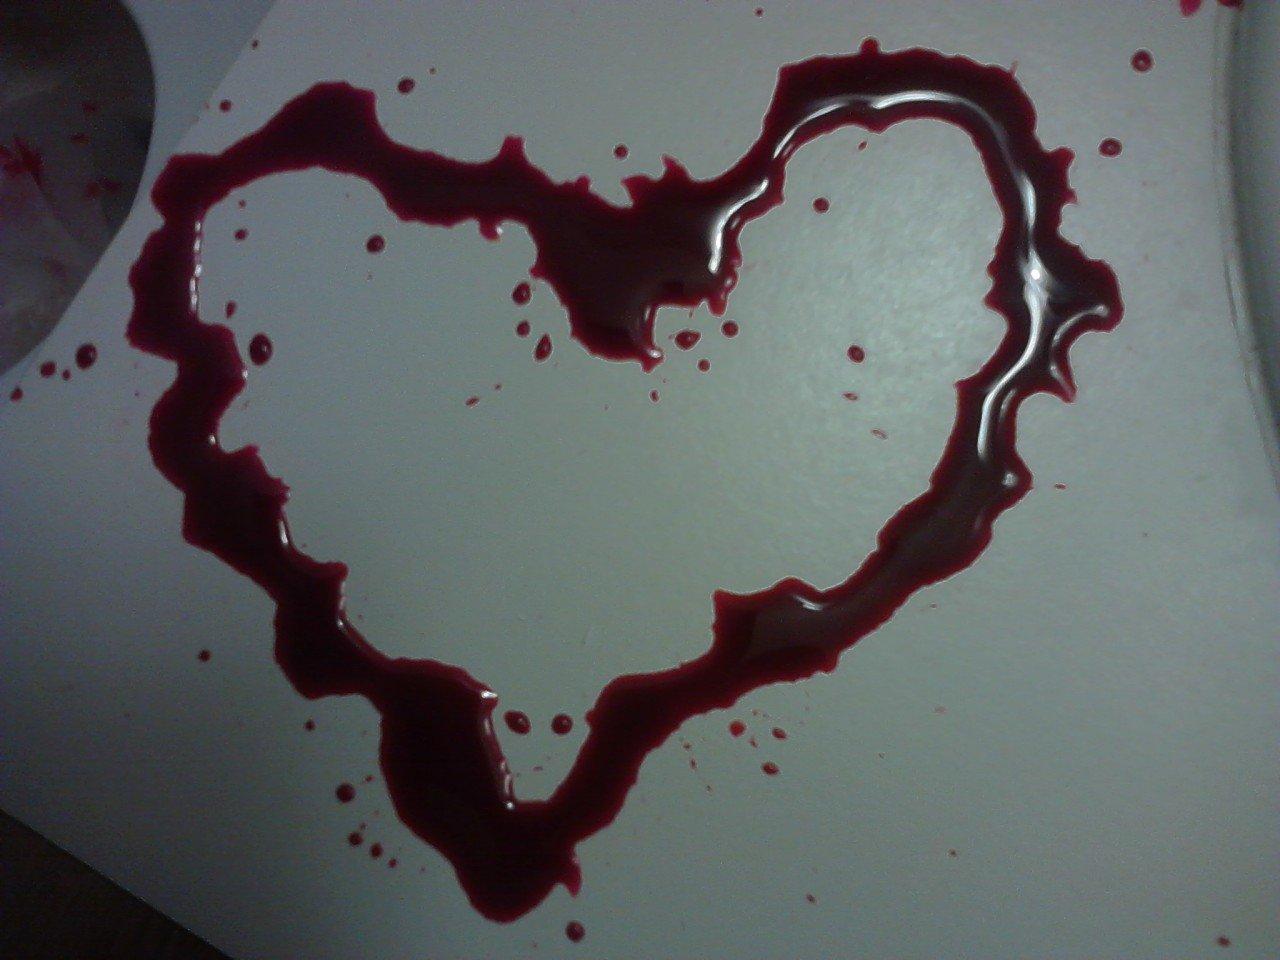 Приворот в полнолуние на крови